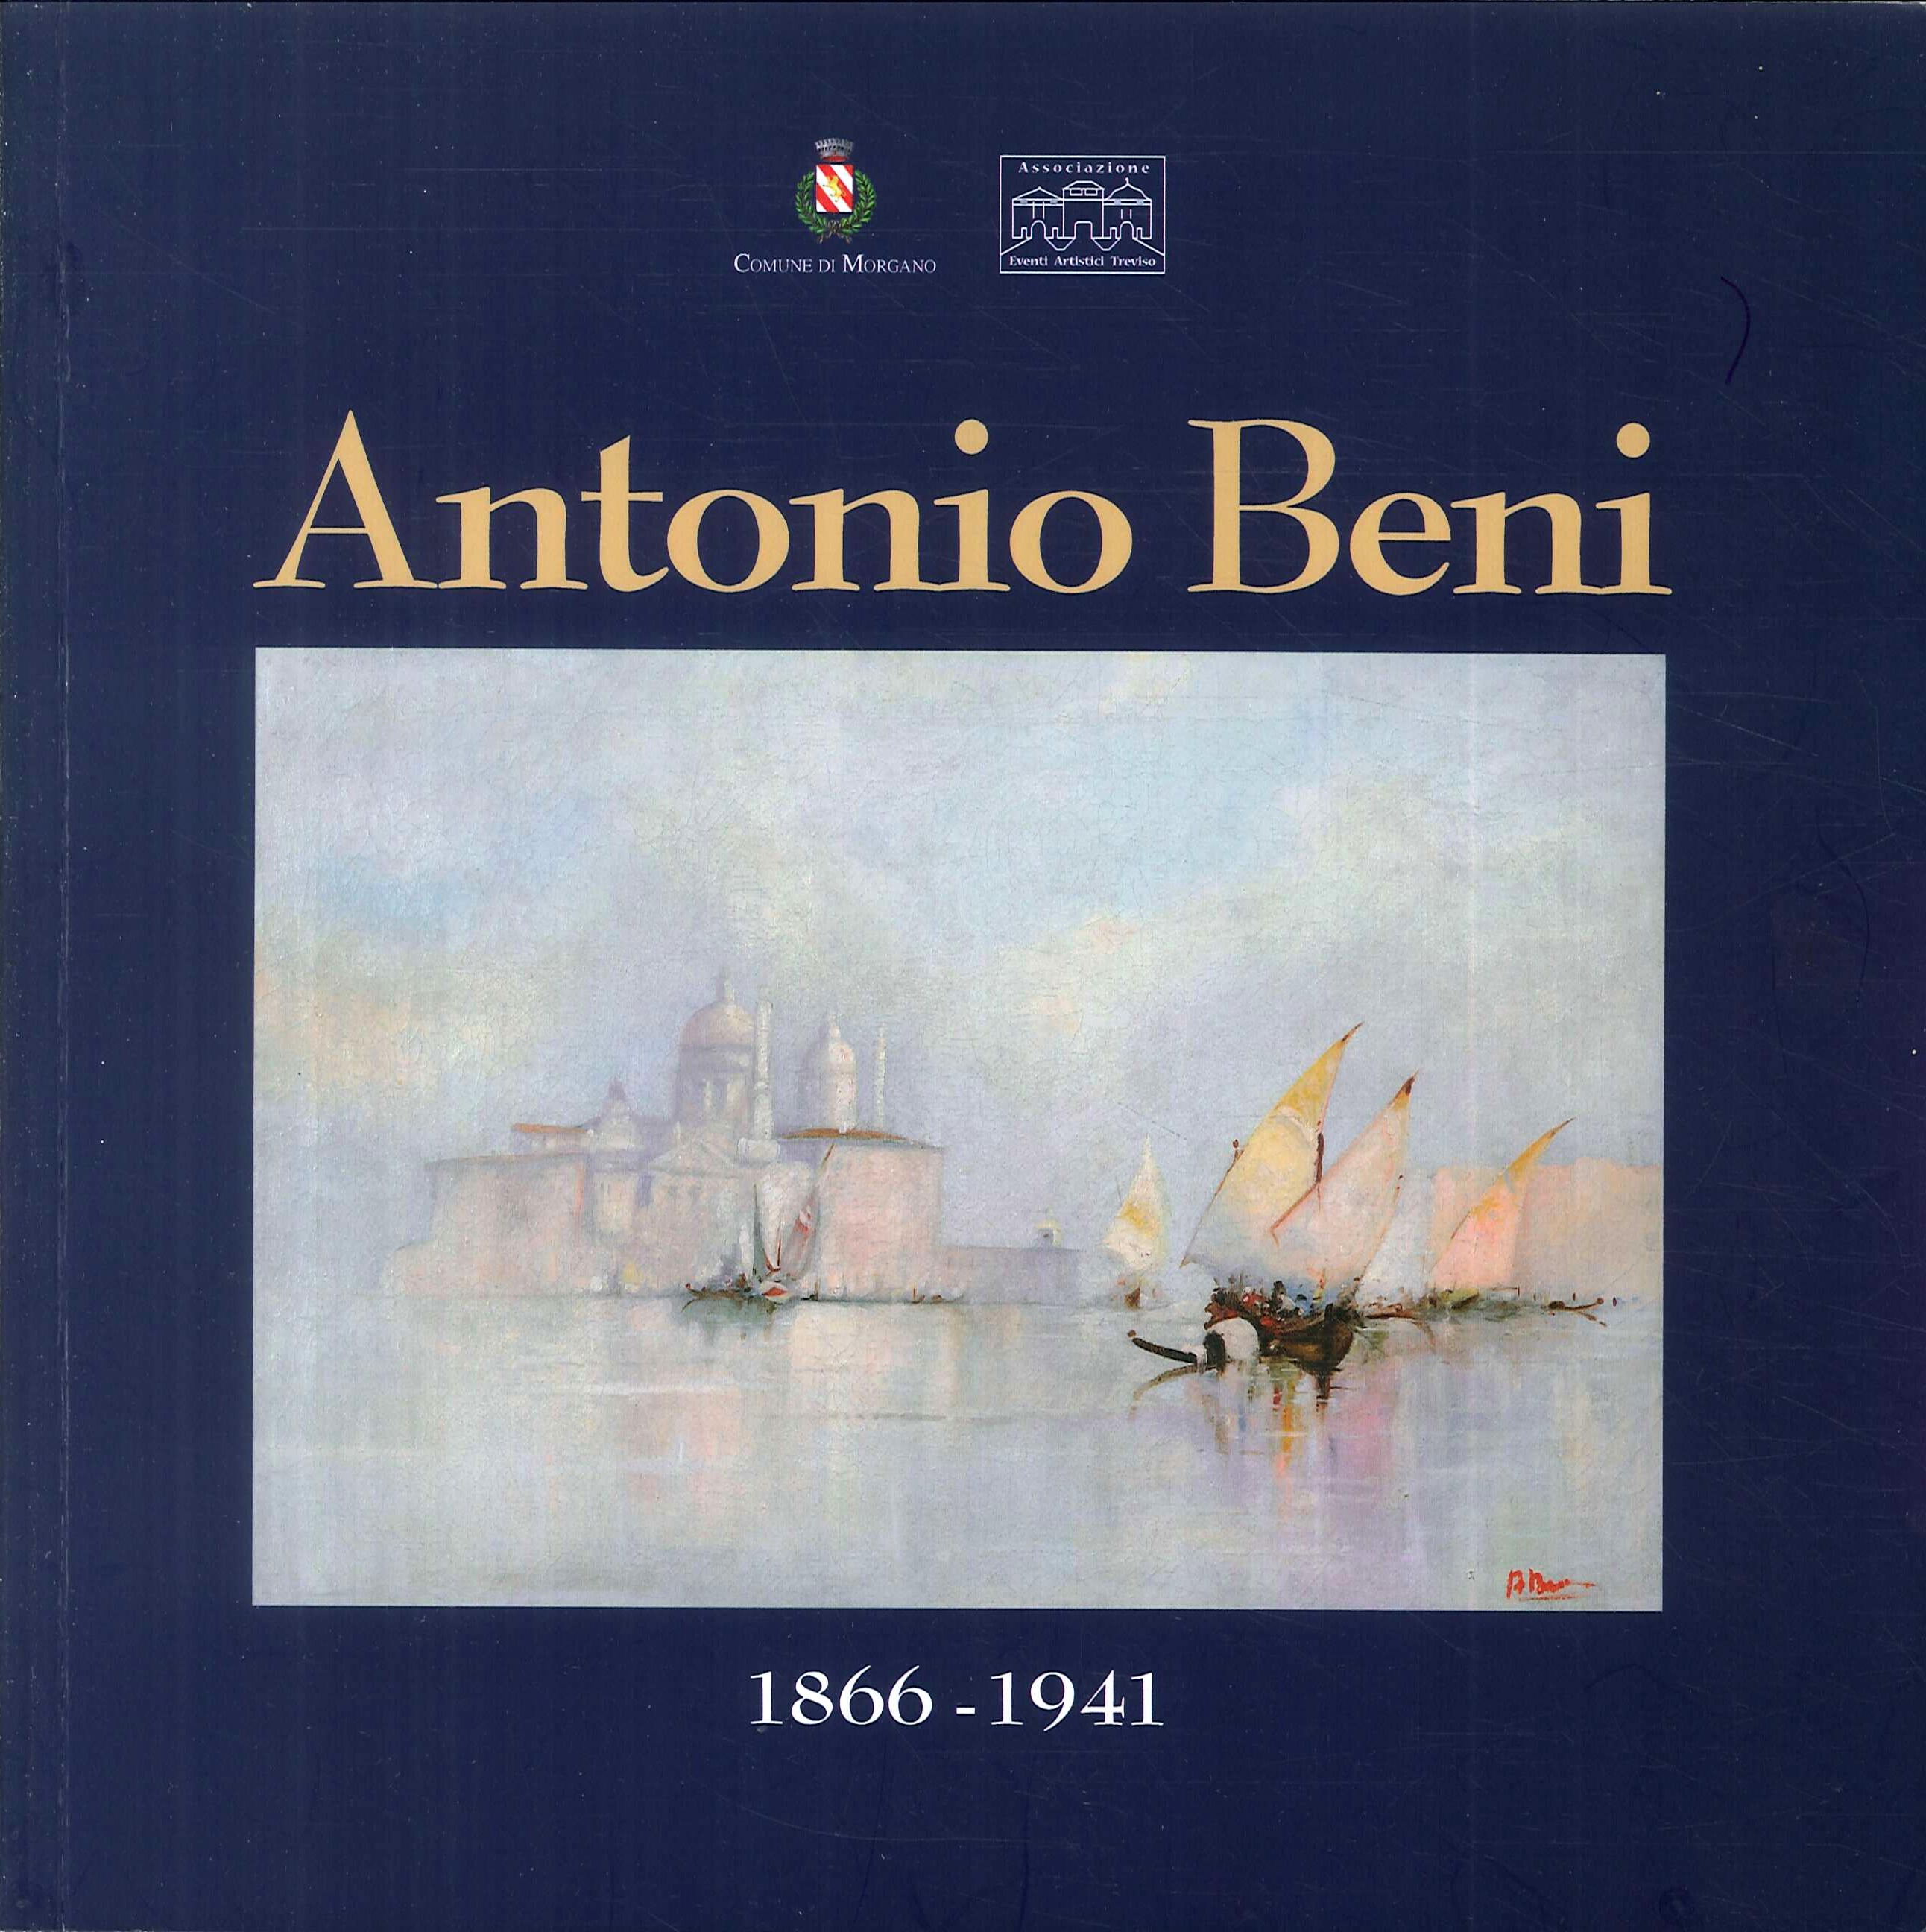 Antonio Beni, 1866-1941